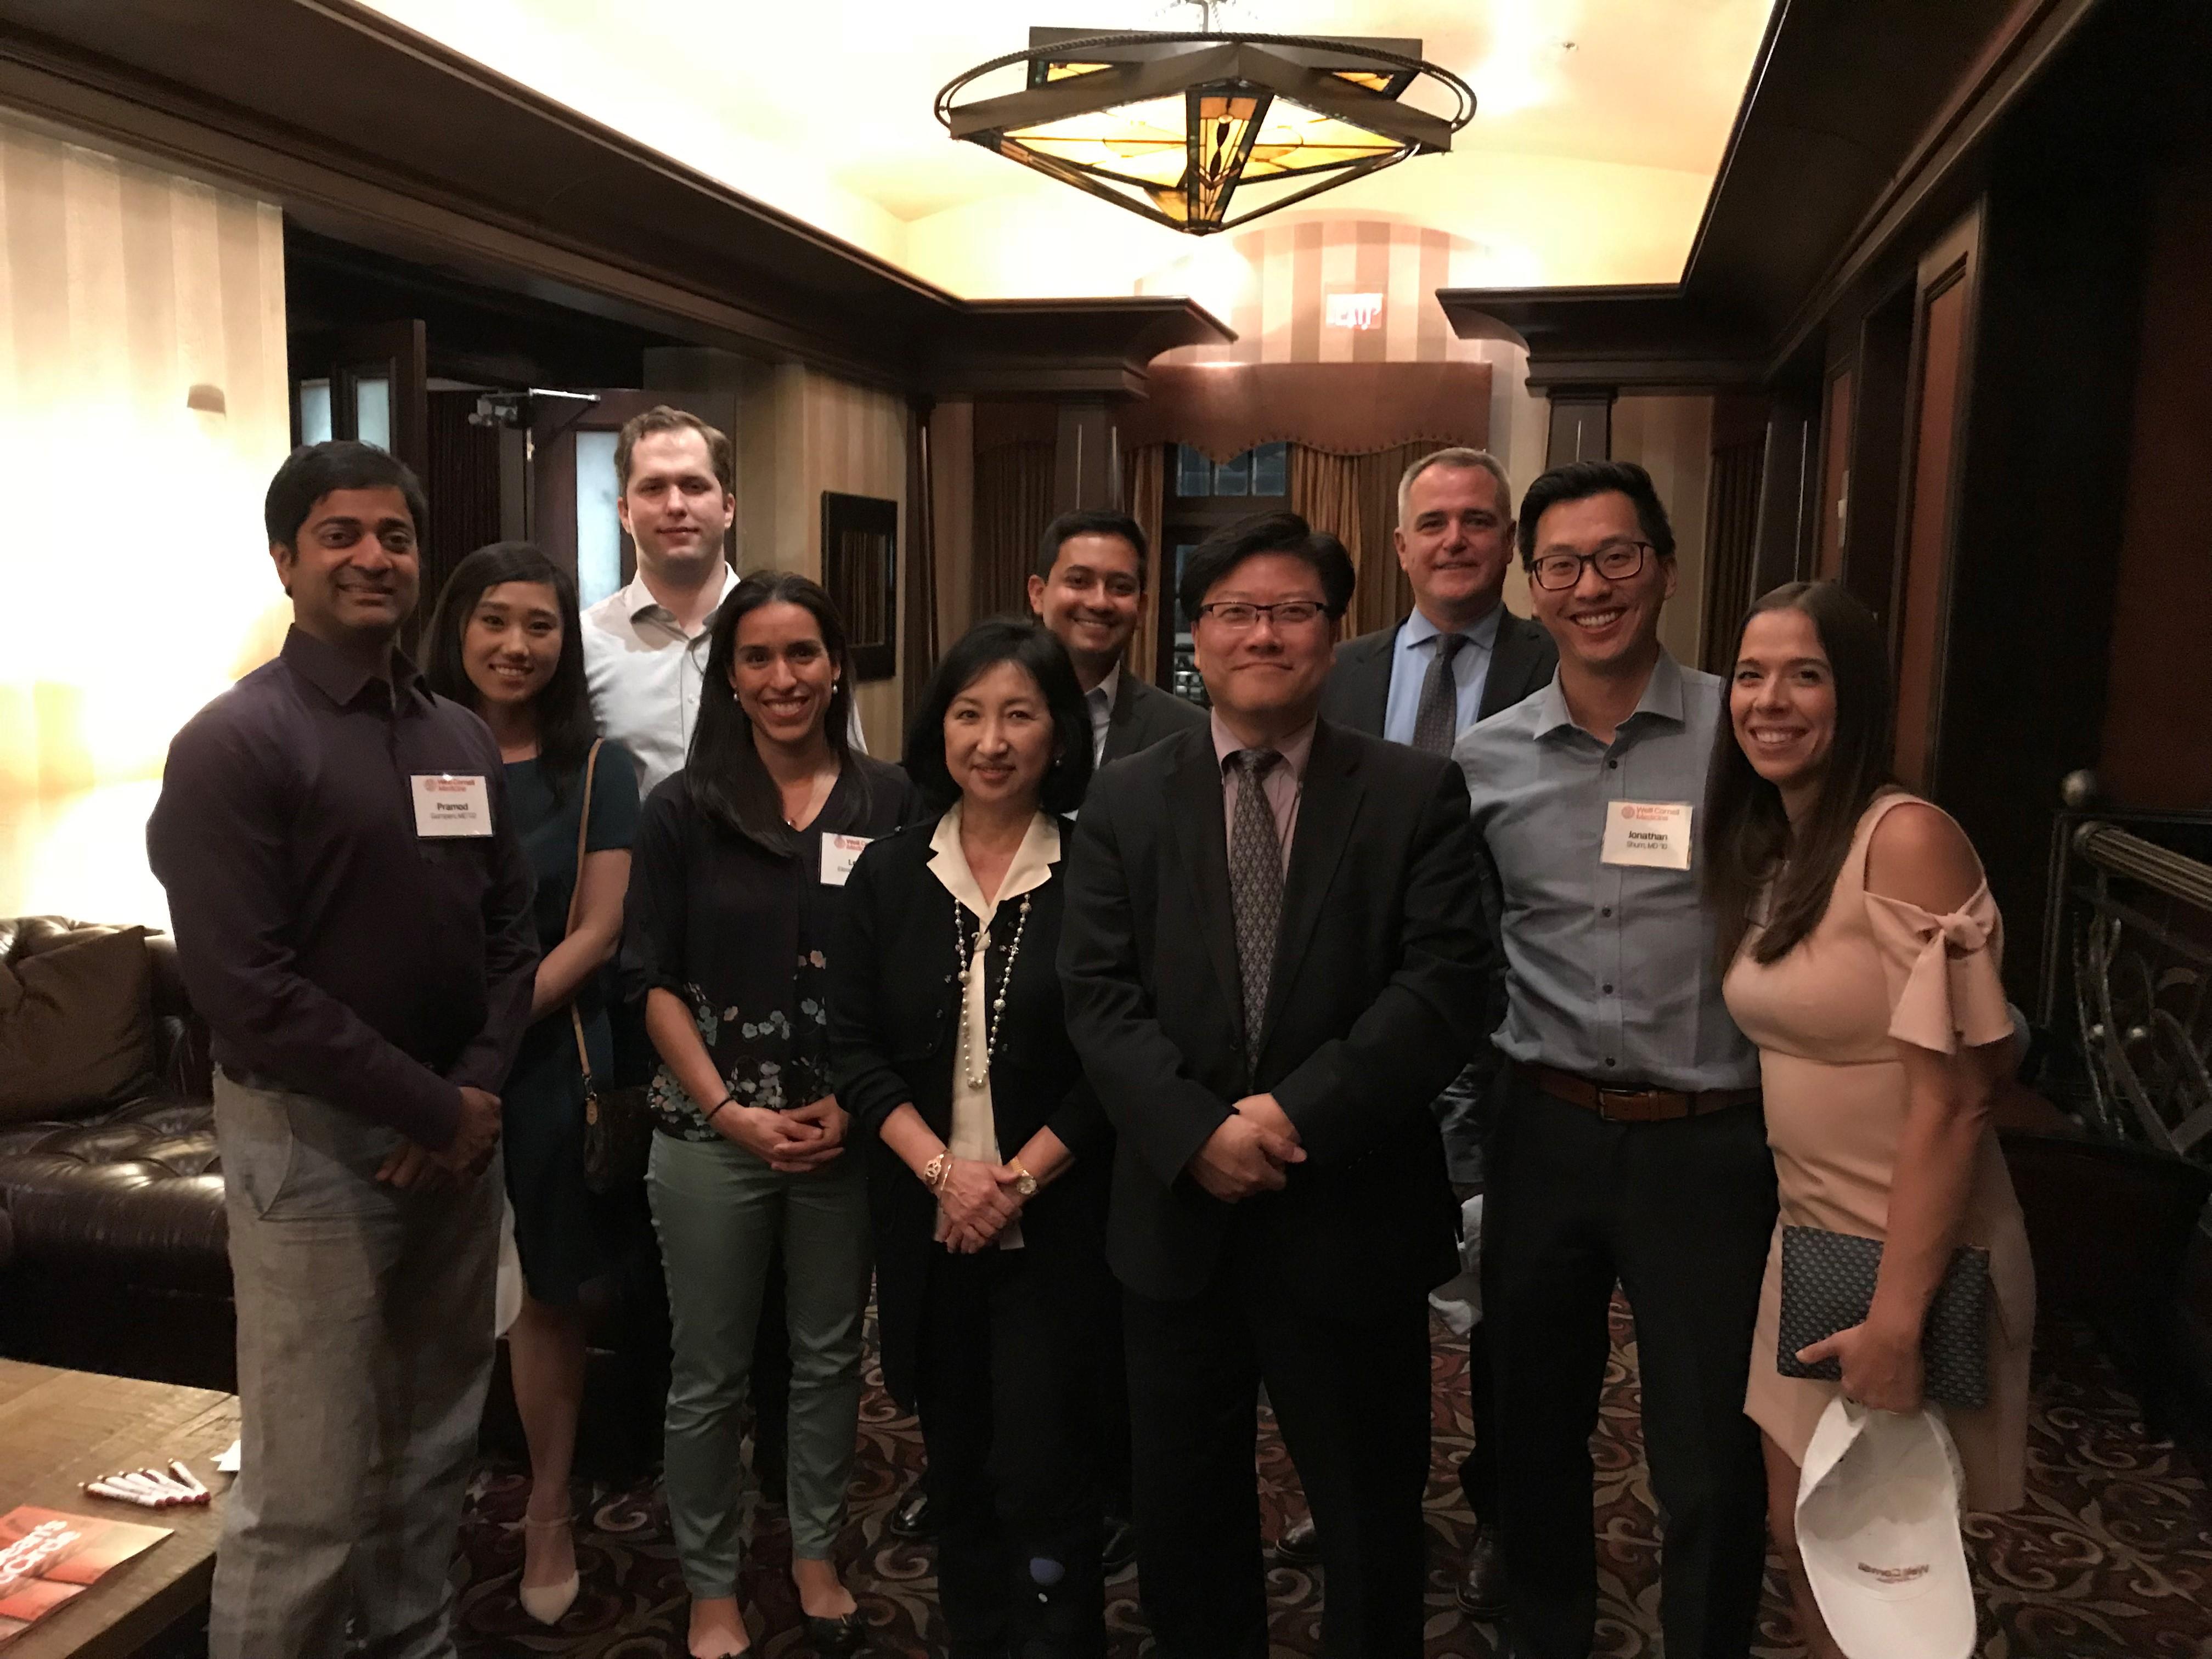 alumni at event in Houston